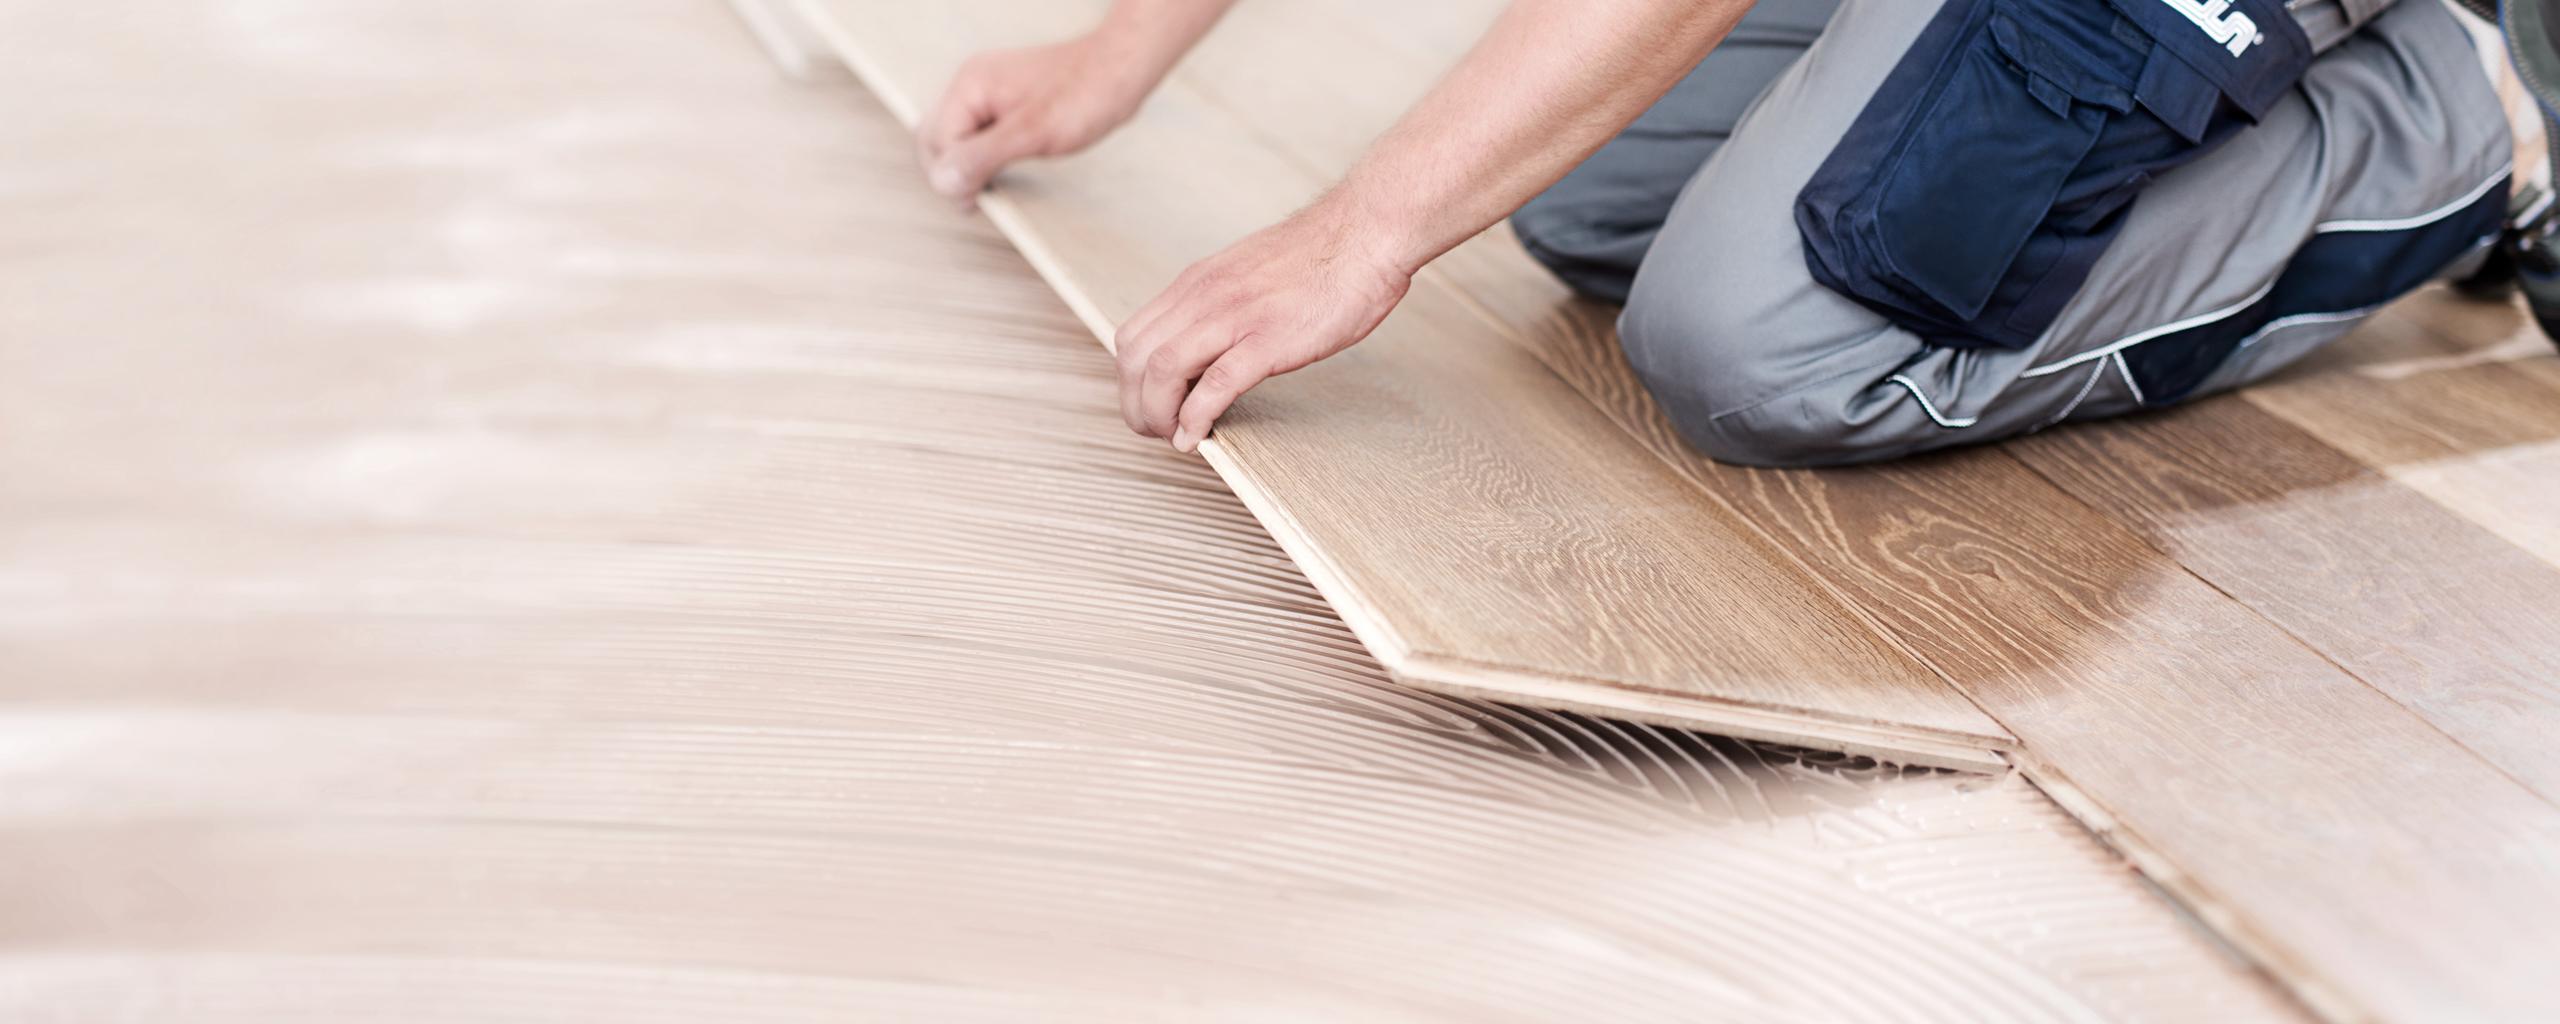 polyurethanklebstoffe uzin und der boden geh rt dir. Black Bedroom Furniture Sets. Home Design Ideas